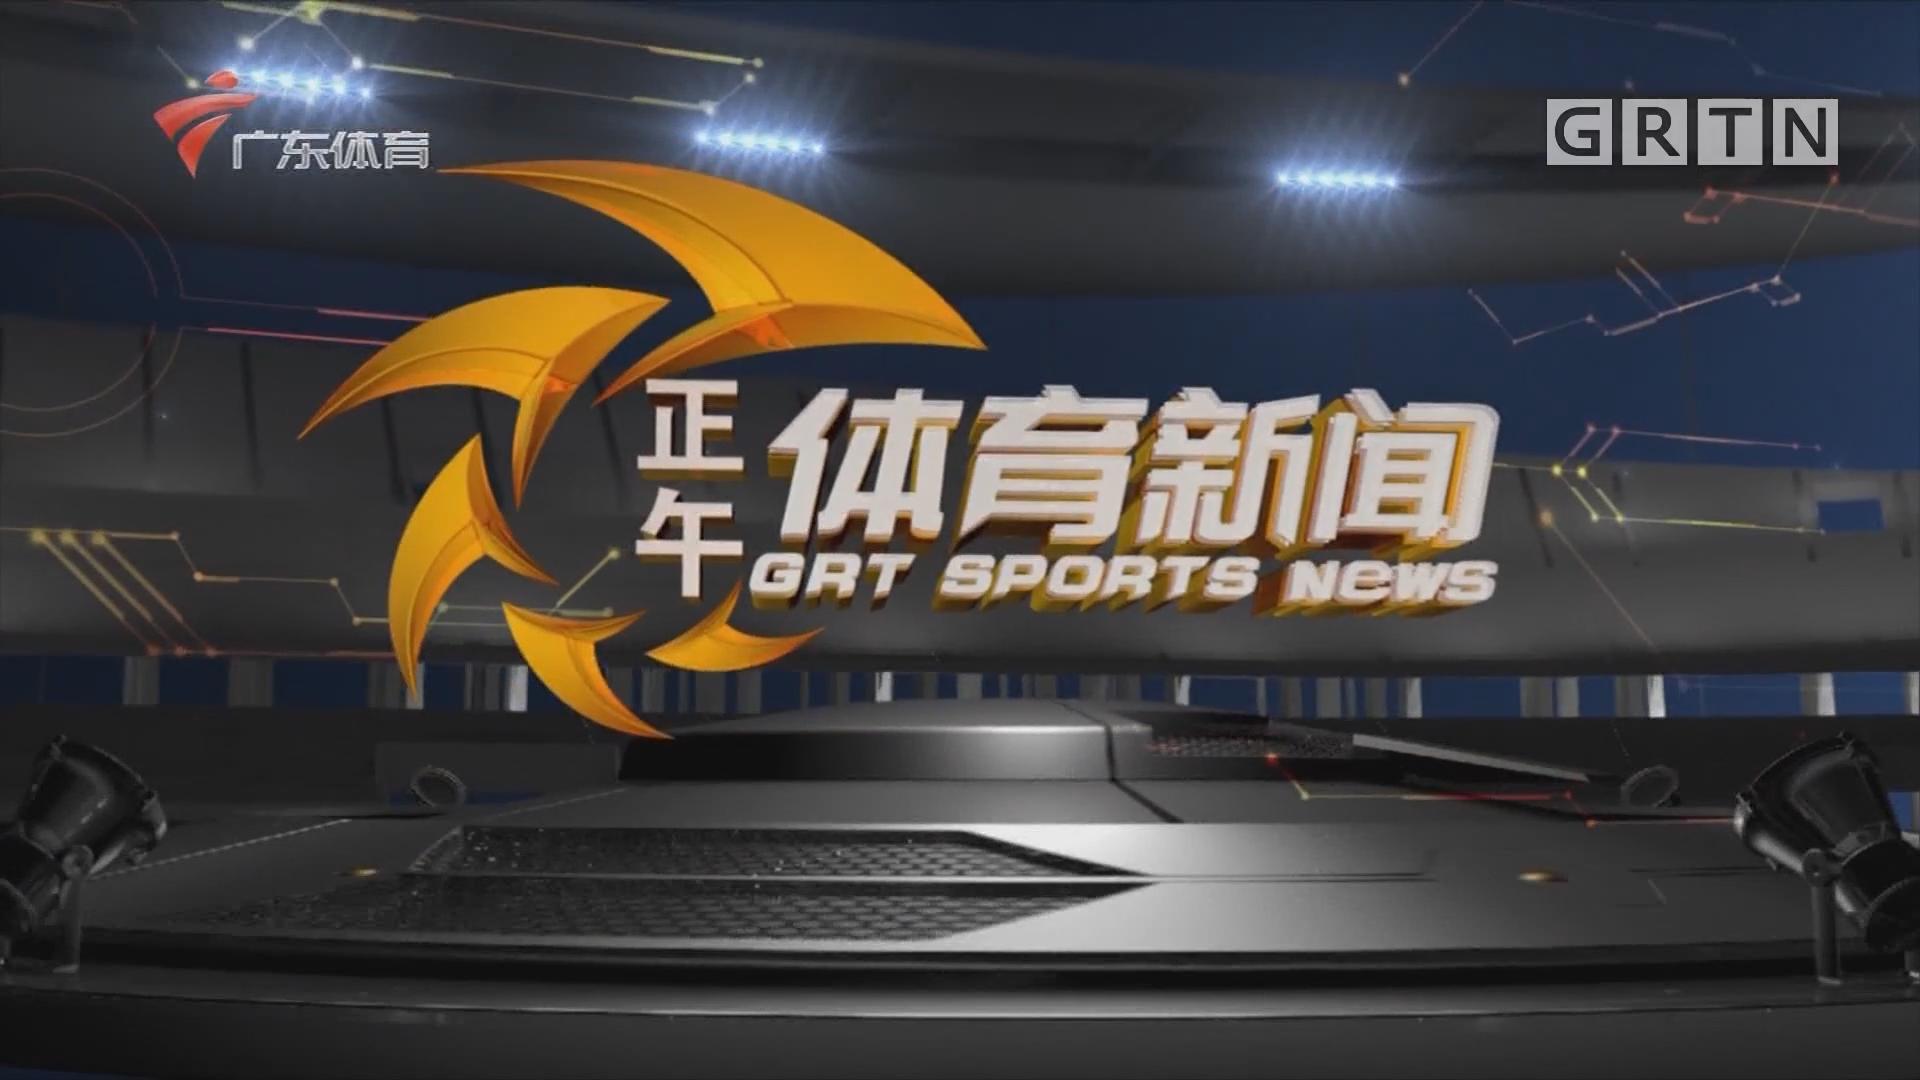 [HD][2020-05-14]正午体育新闻:中国足协会议在沪进行 会议未形成决议